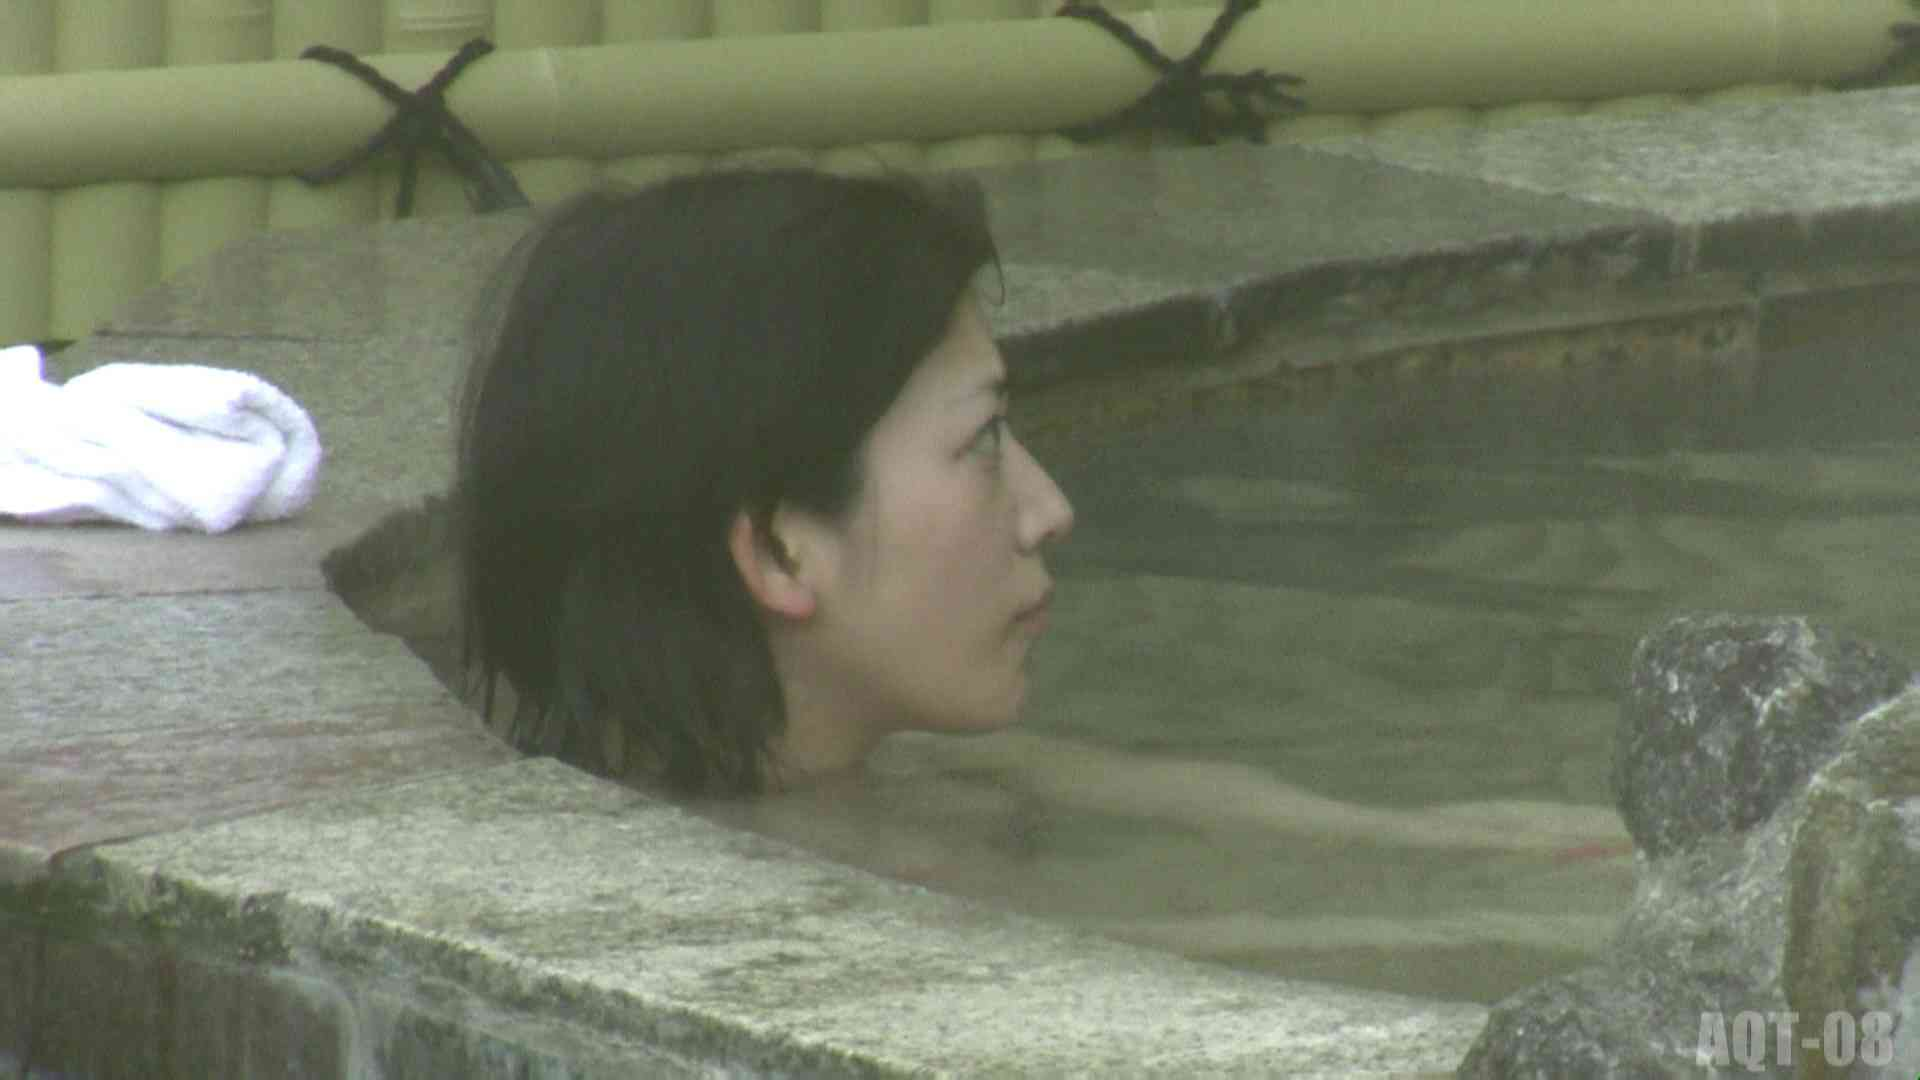 Aquaな露天風呂Vol.776 盗撮 | HなOL  60pic 24